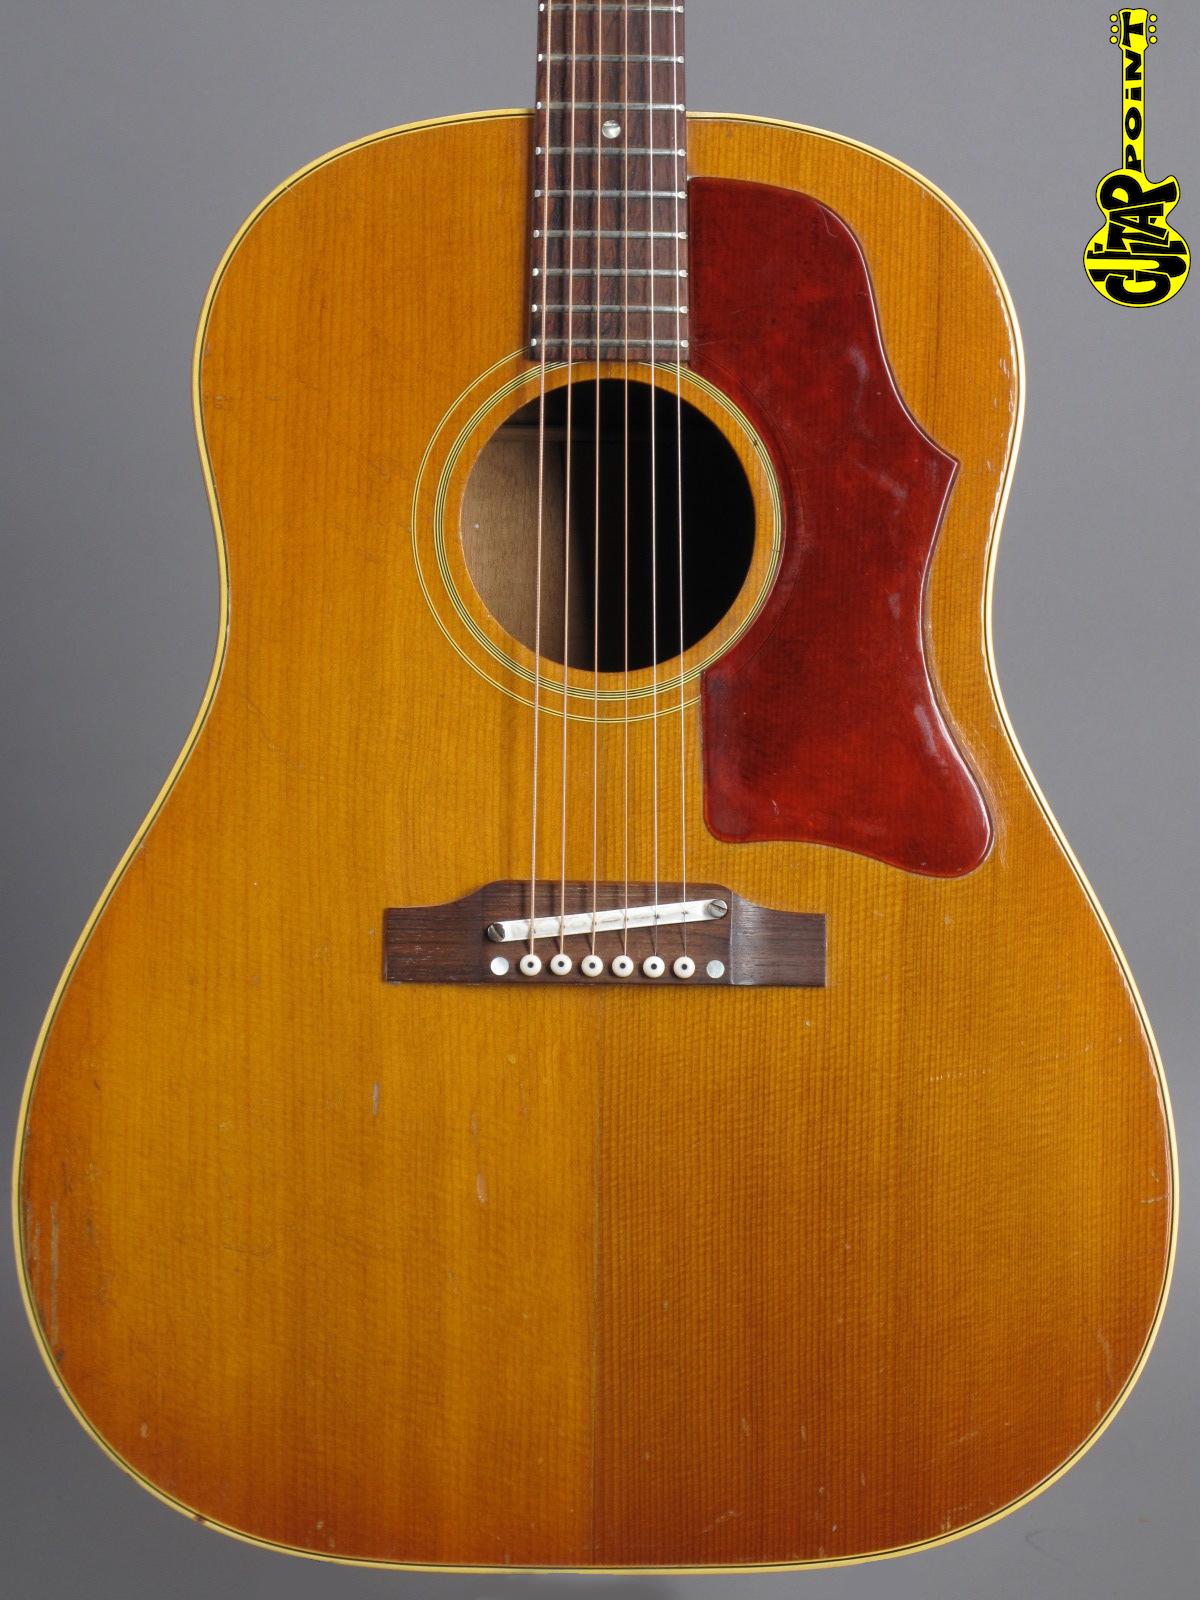 1966 Gibson J-50 - Natural